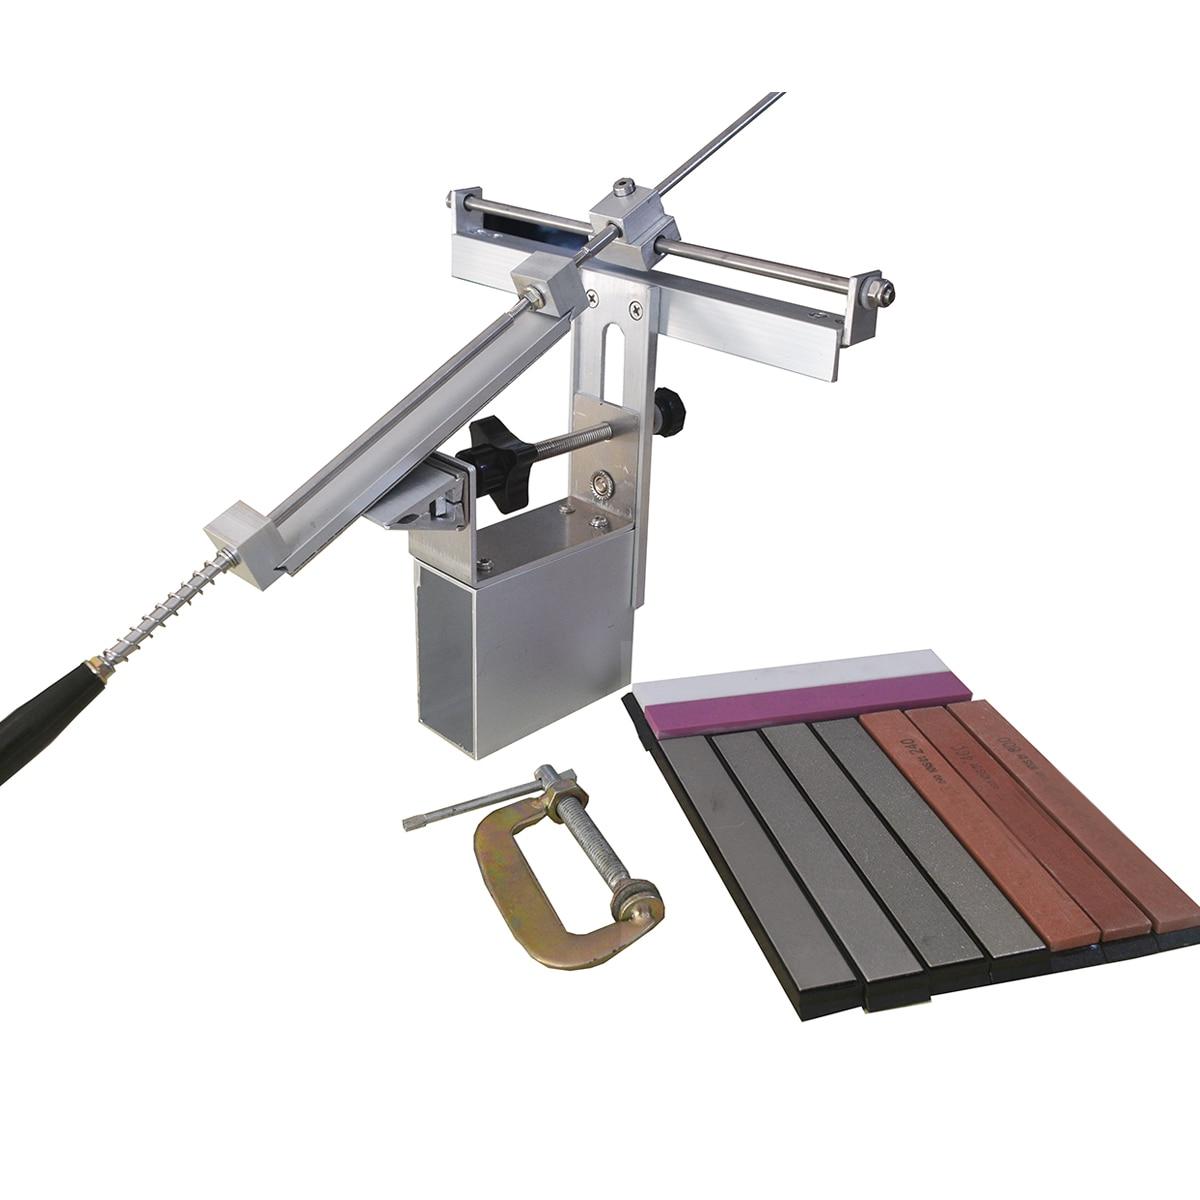 Afilador de cuchillos de cocina, sistema de actualización profesional Pro apex, afilador de cuchillos, piedras de afilar KME diamond